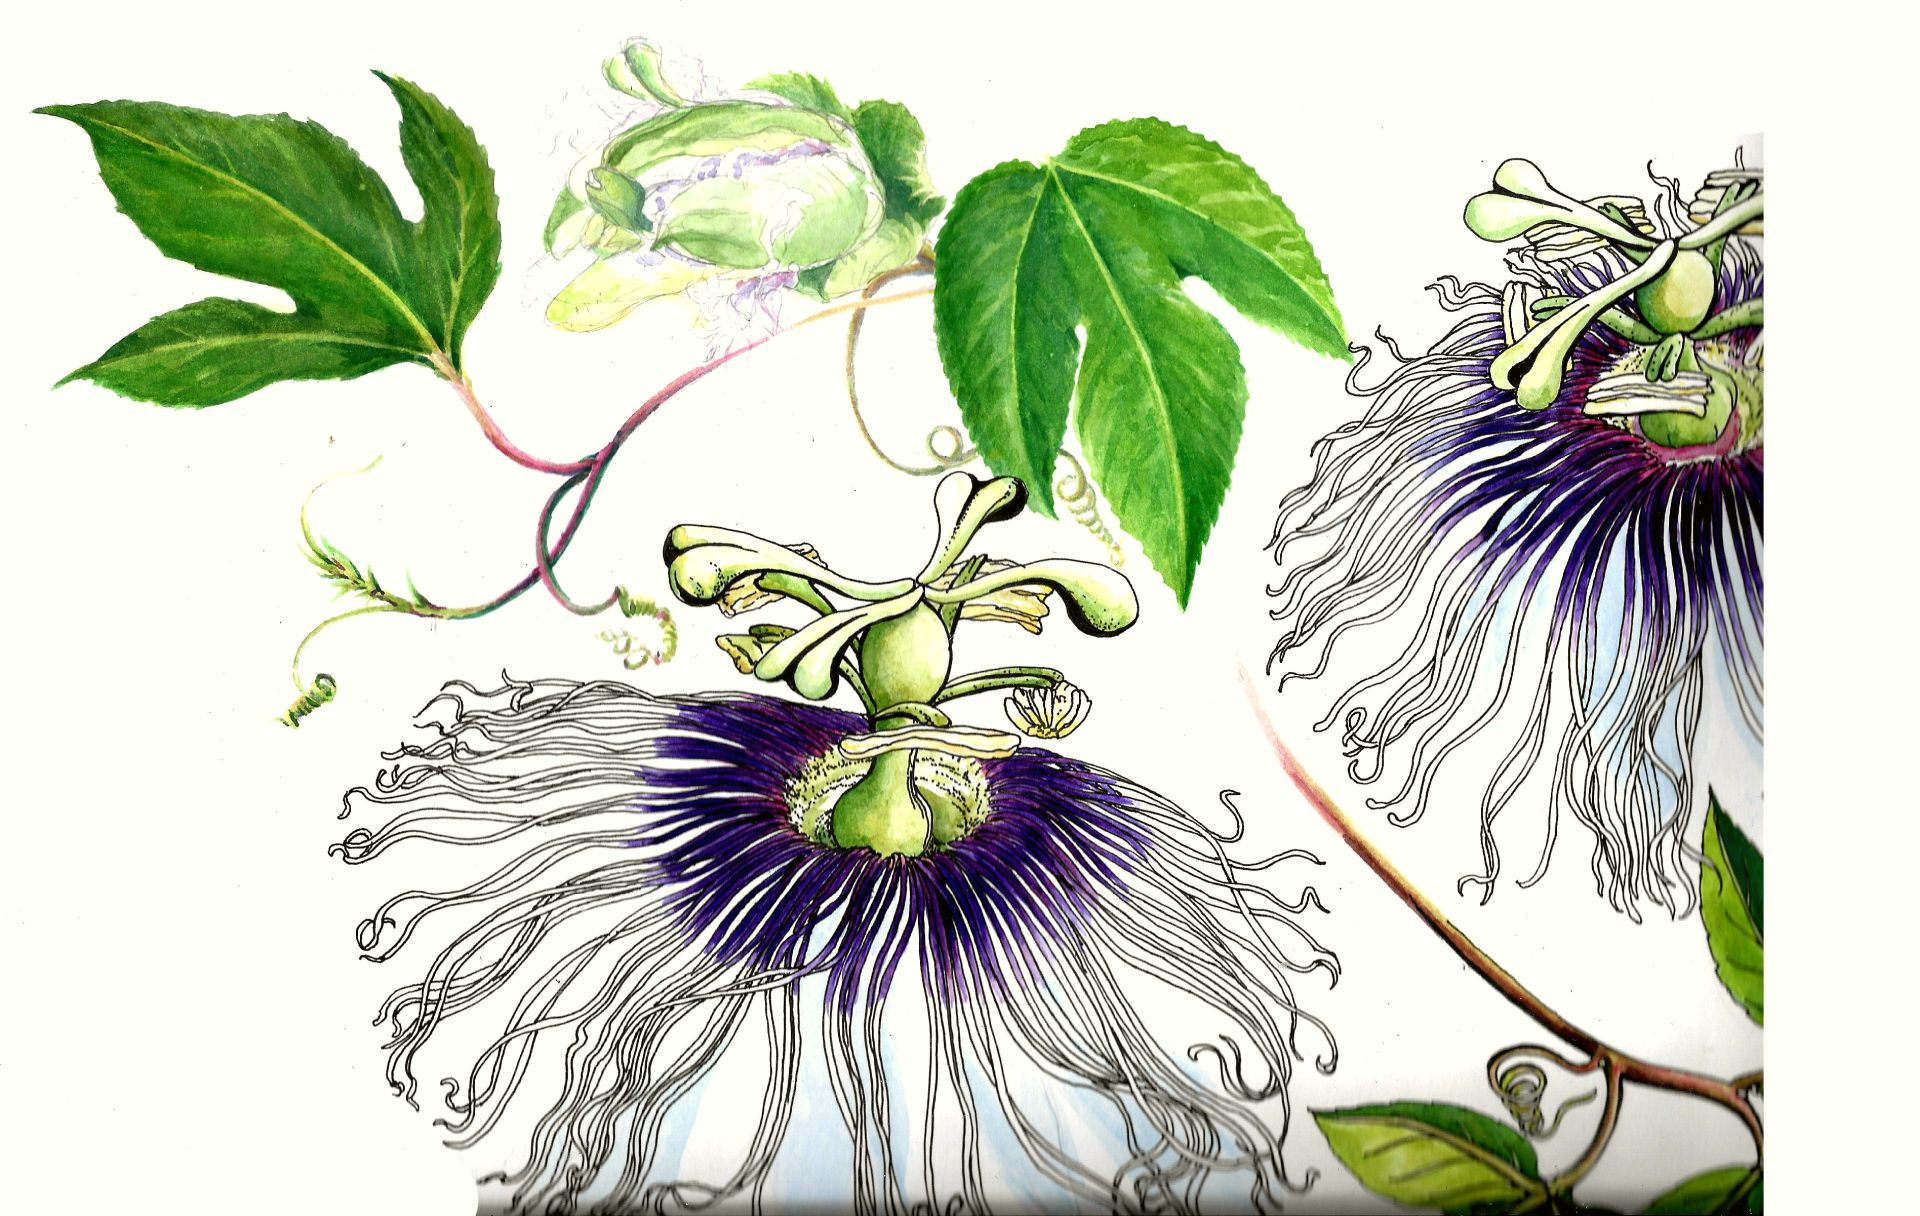 JPG MARACUYA with new old flower scan 3 contrast 25 percent